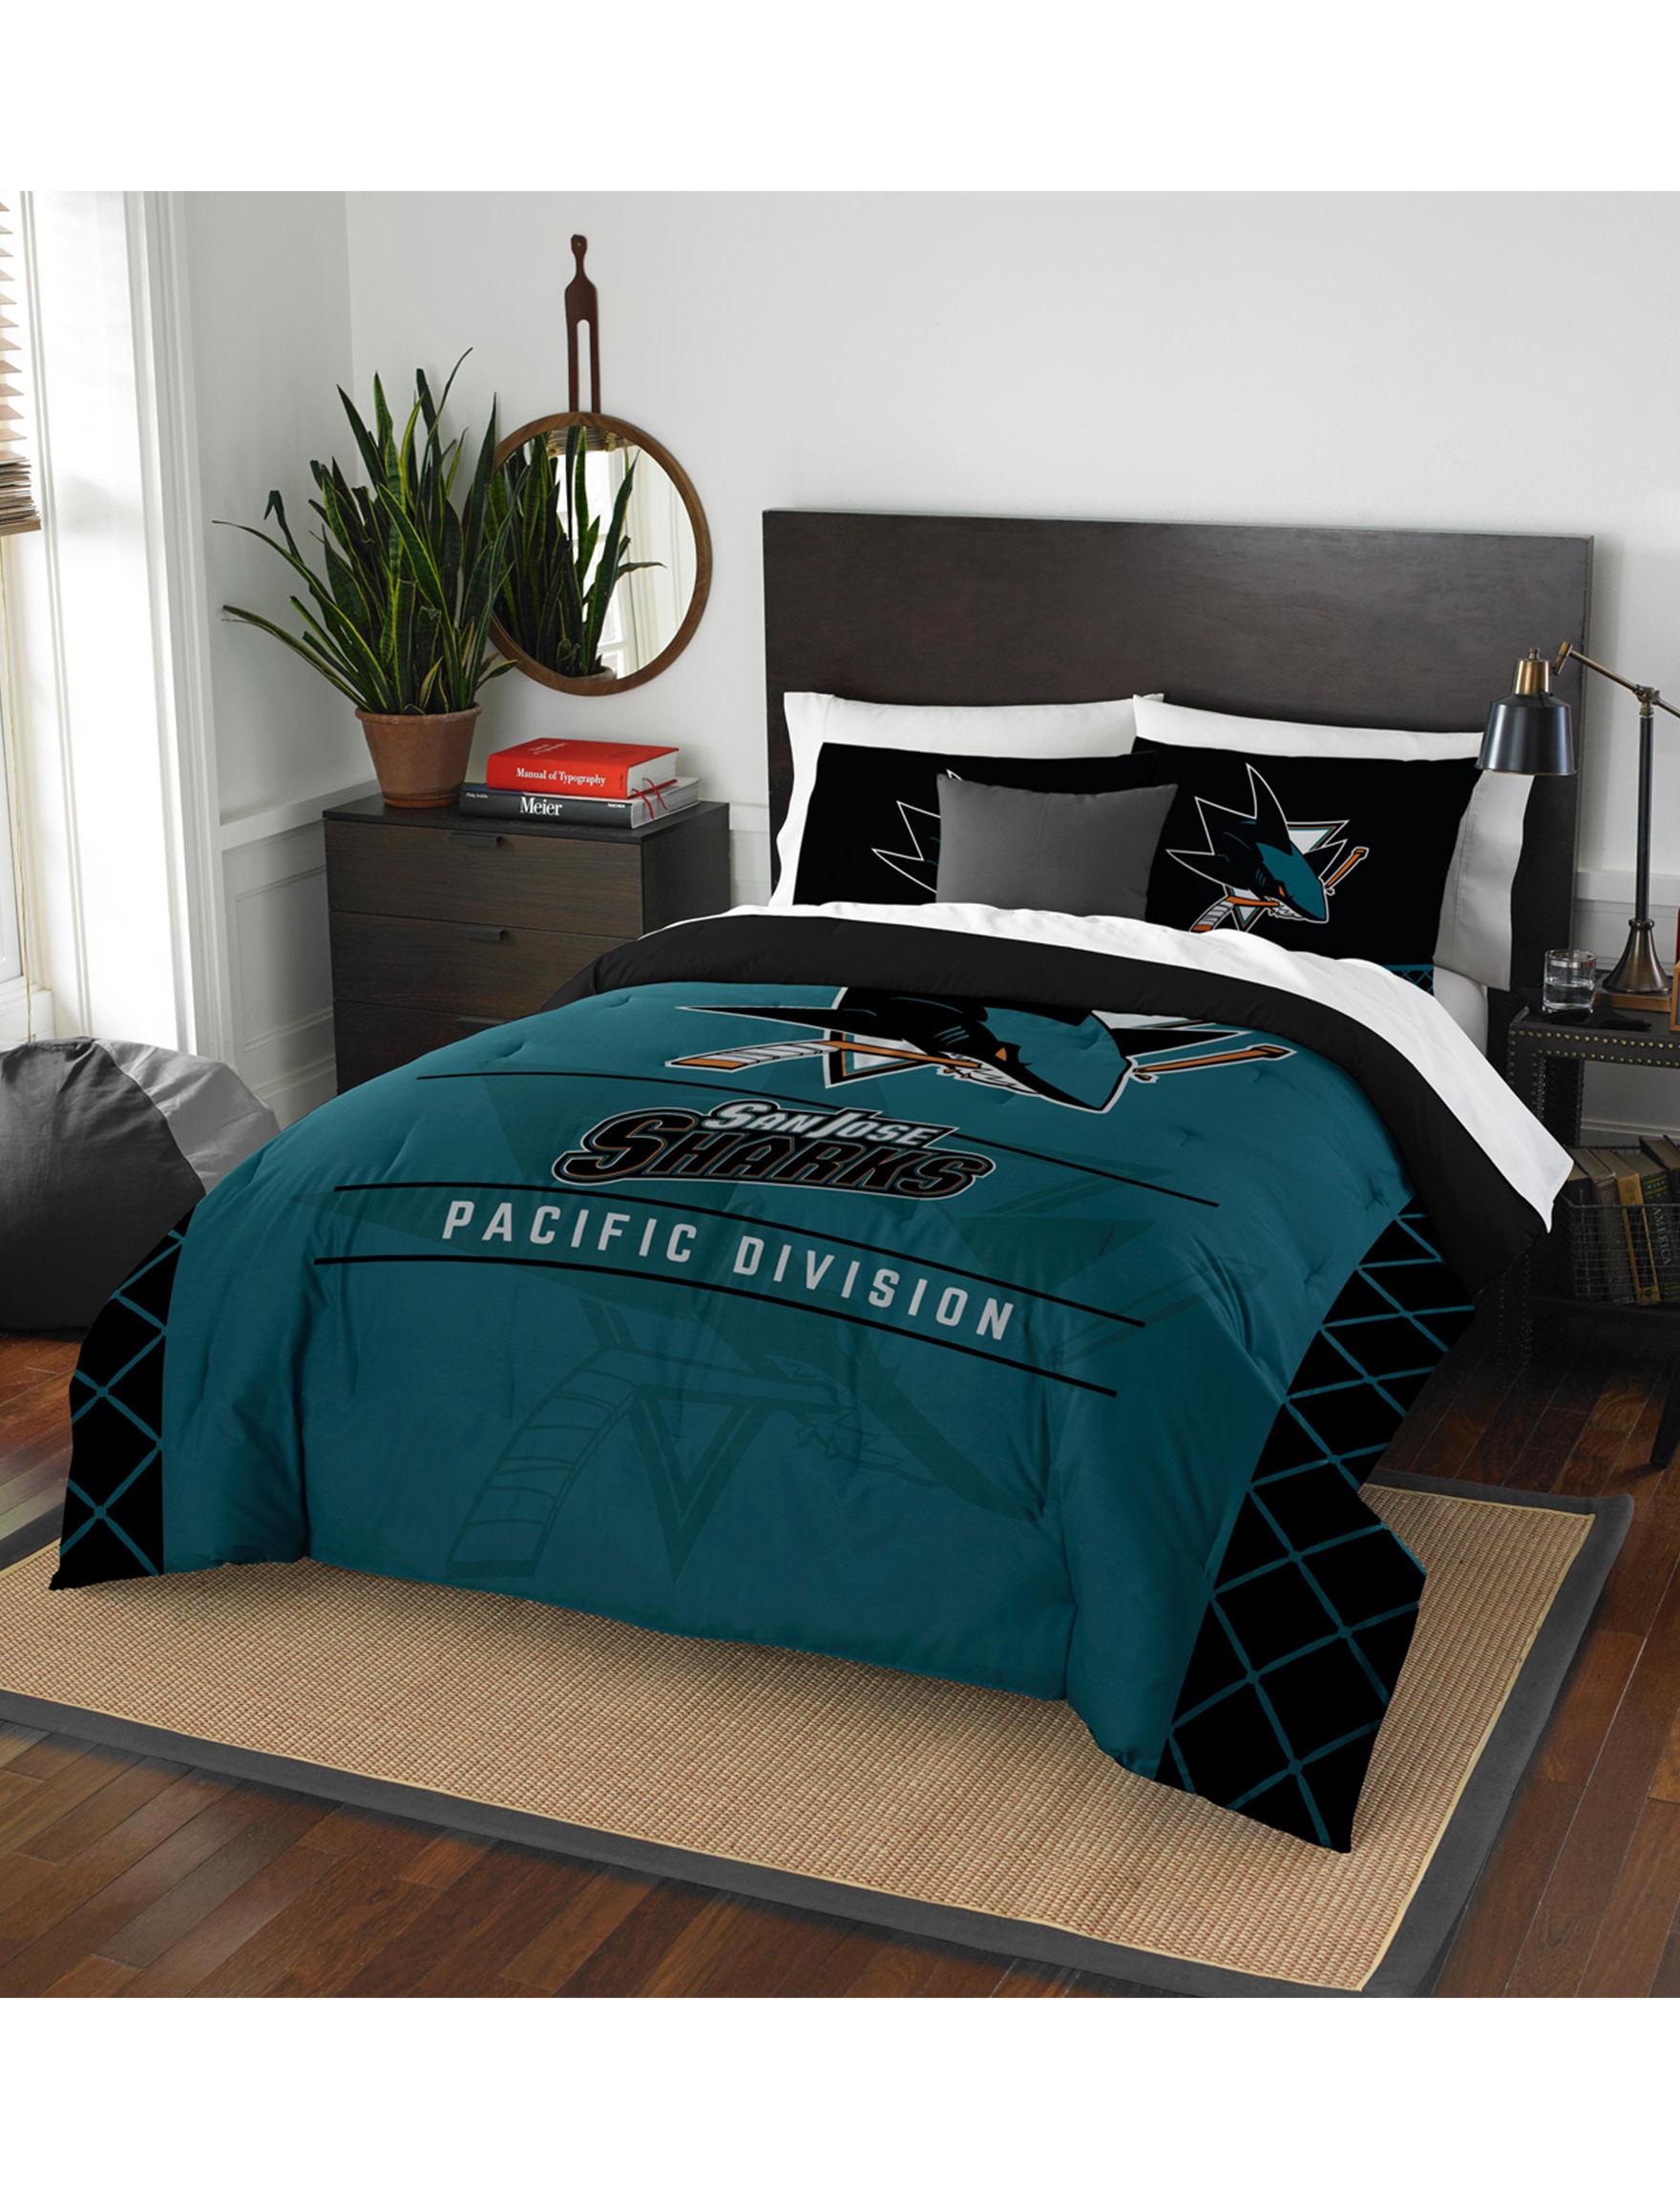 The Northwest Company Teal / Black Comforters & Comforter Sets